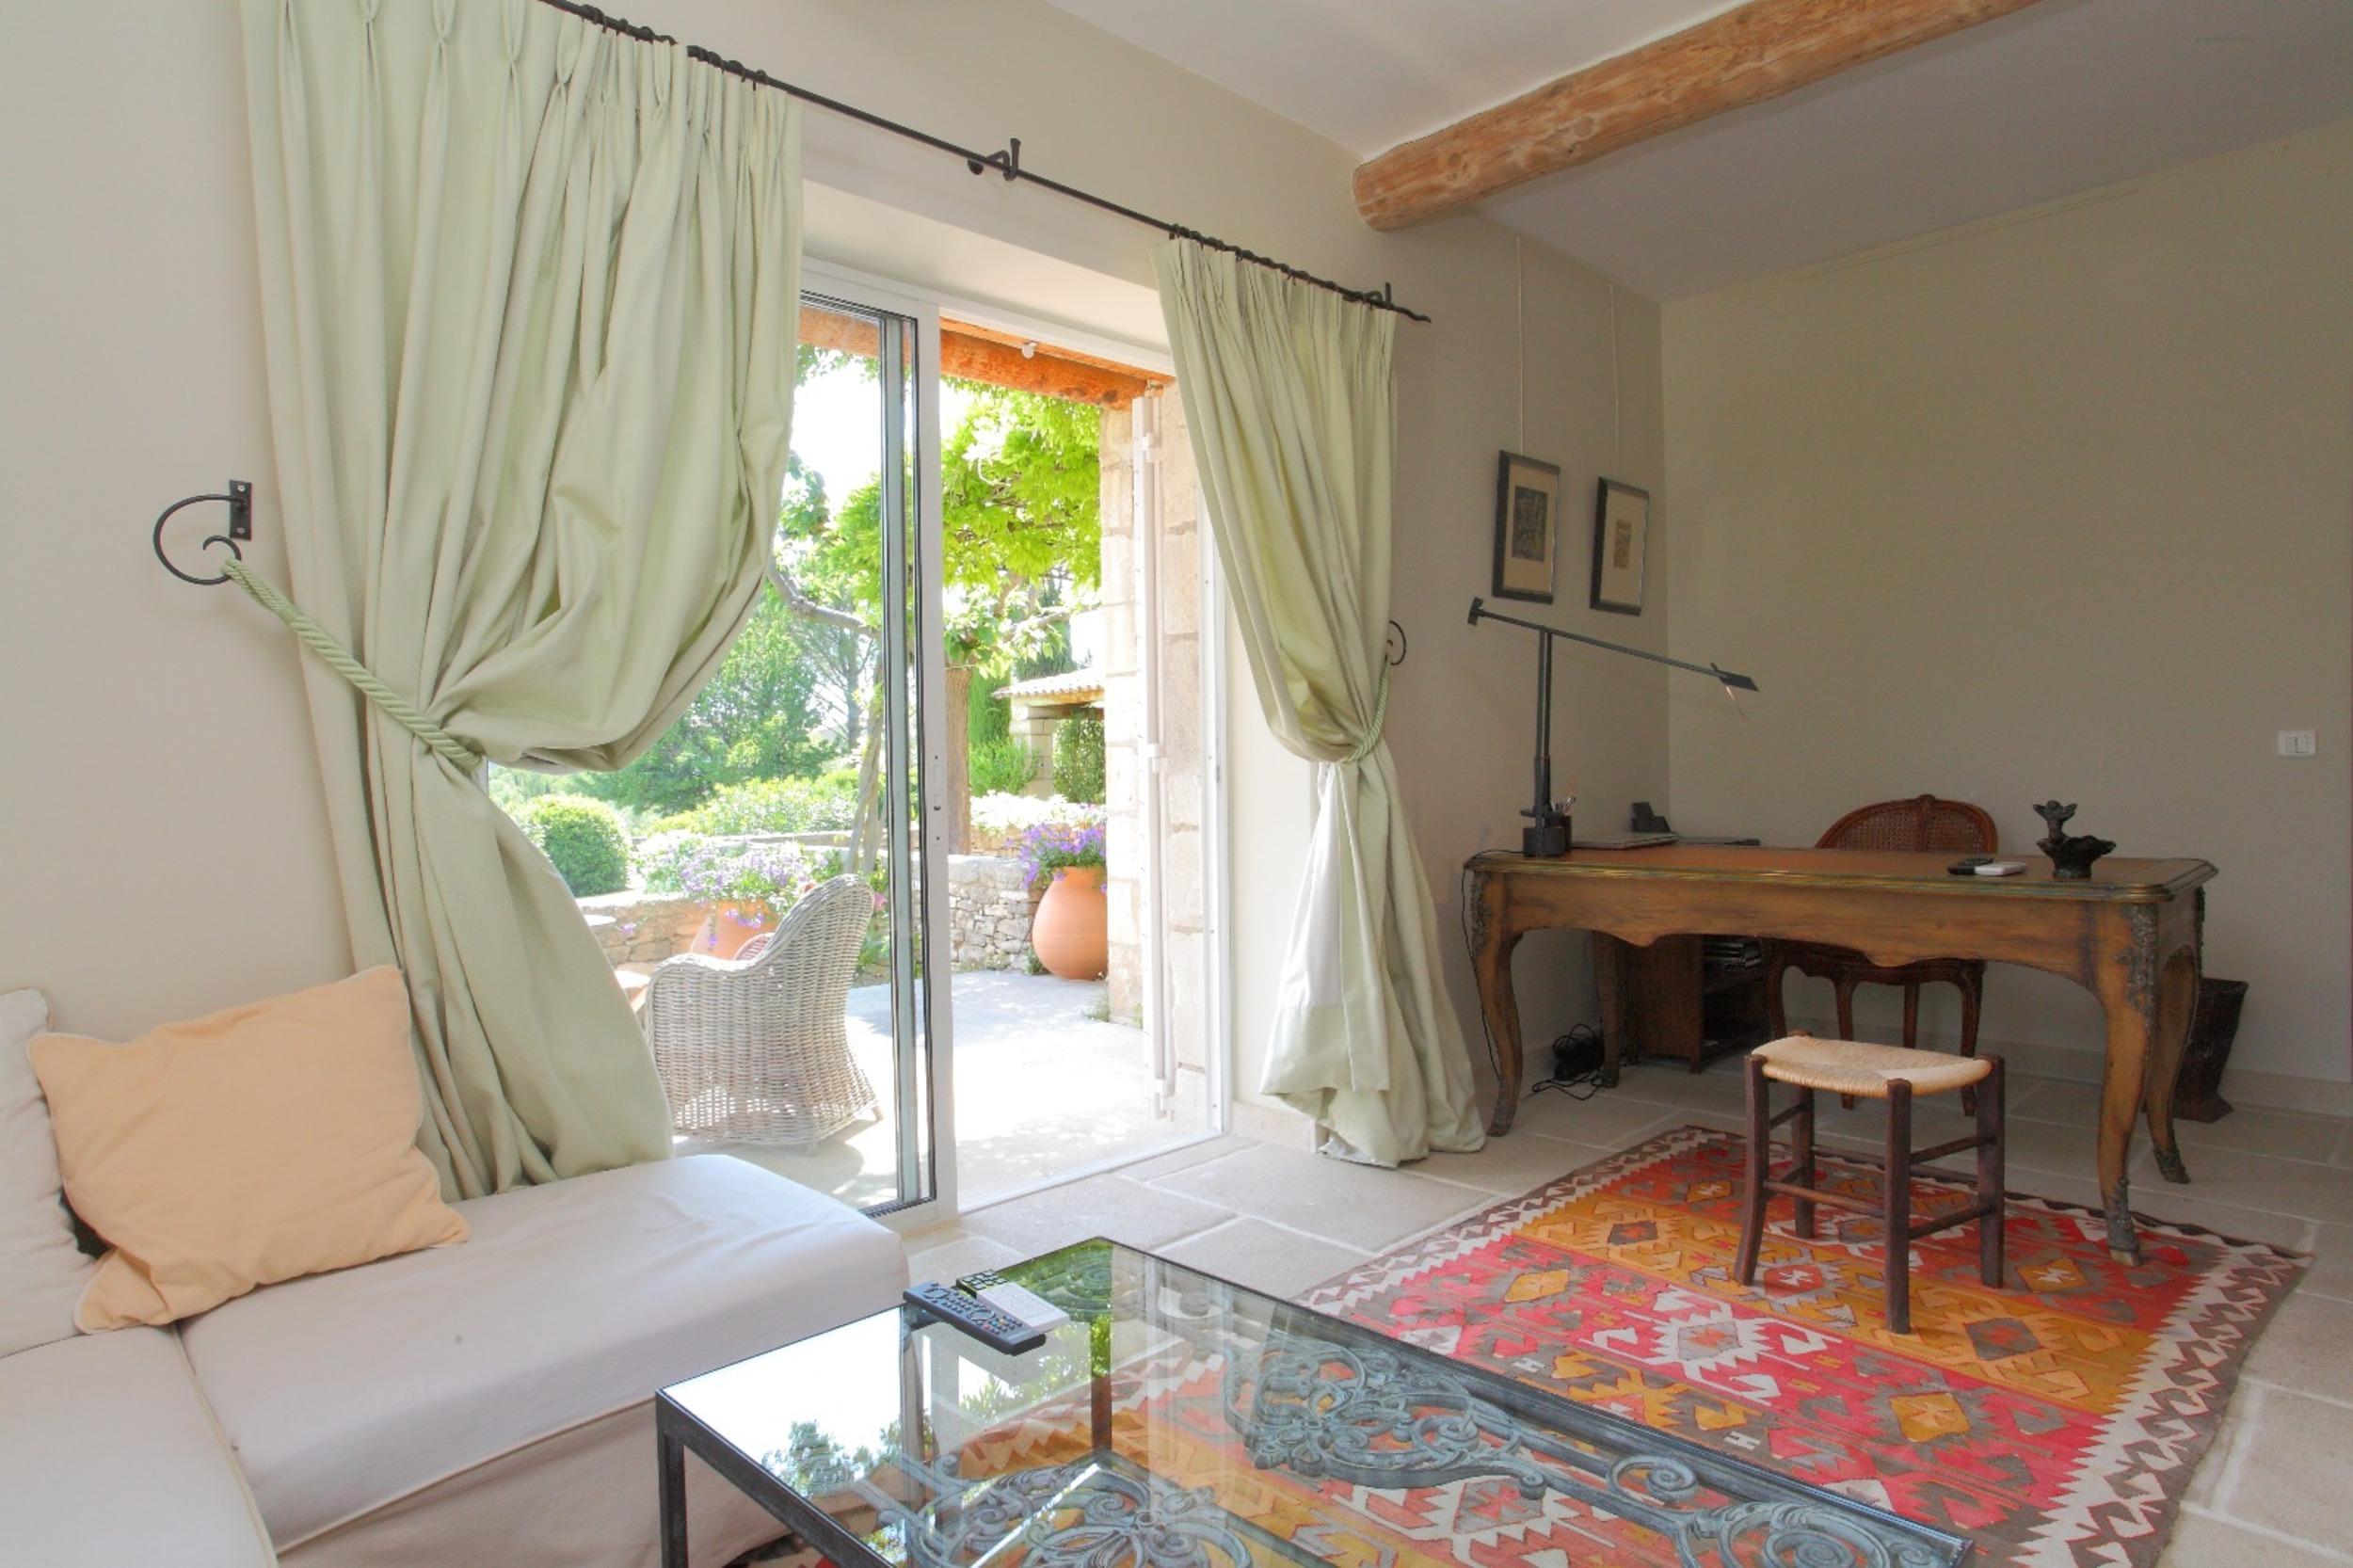 Holiday house Der Fall - Fabelhaftes Landhaus in Gordes (2520443), Gordes, Vaucluse, Provence - Alps - Côte d'Azur, France, picture 11